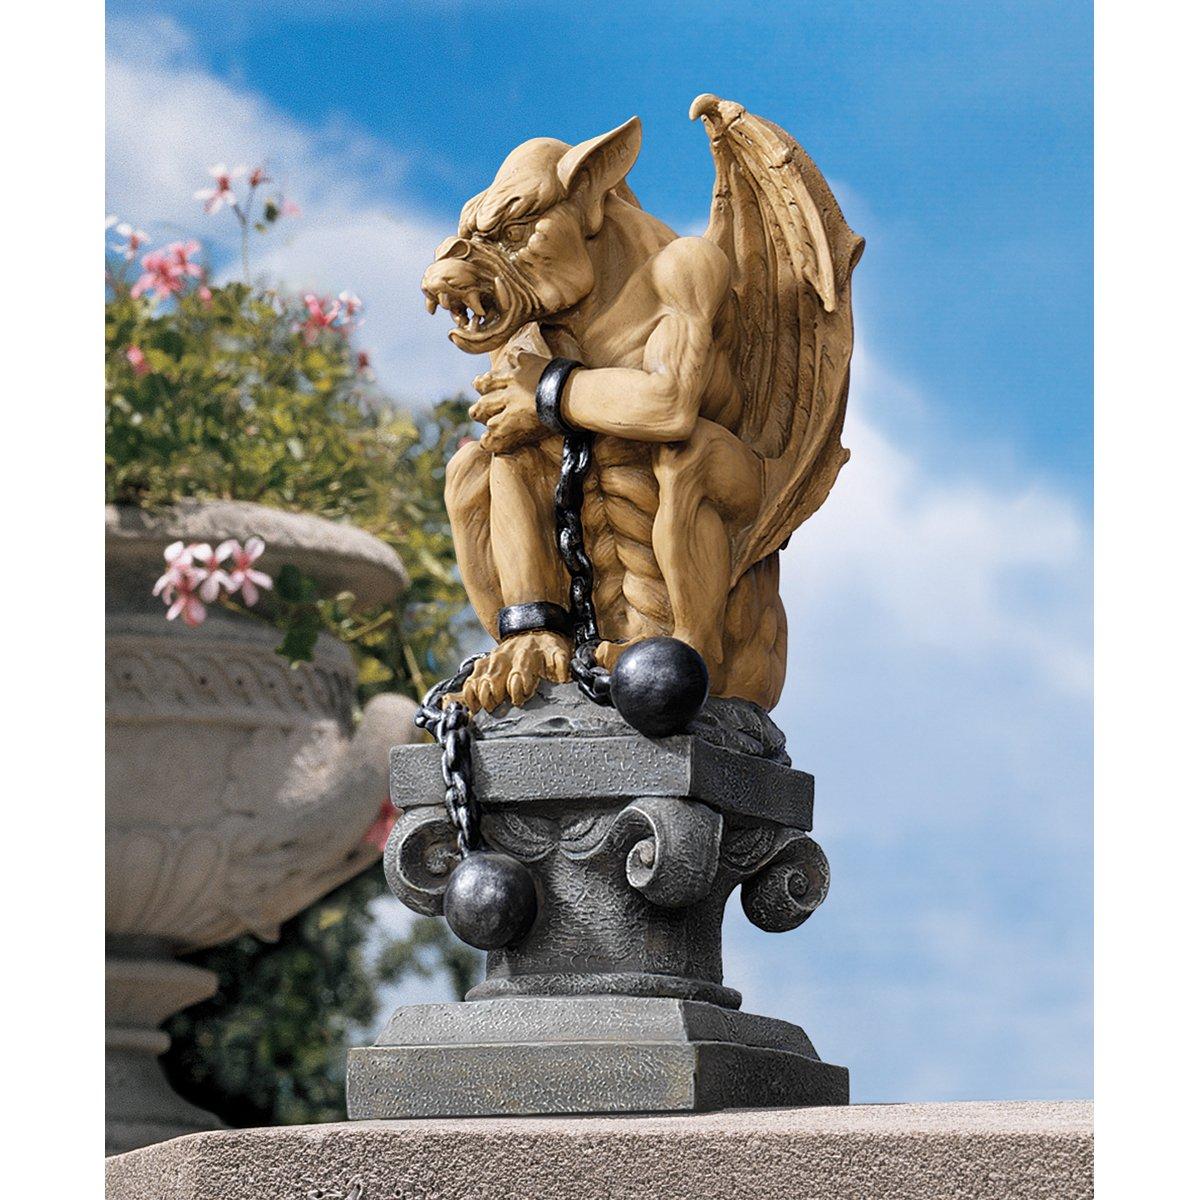 High Quality Amazon.com : Design Toscano Ball And Chain Gothic Dungeon Gargoyle Statue :  Outdoor Statues : Garden U0026 Outdoor